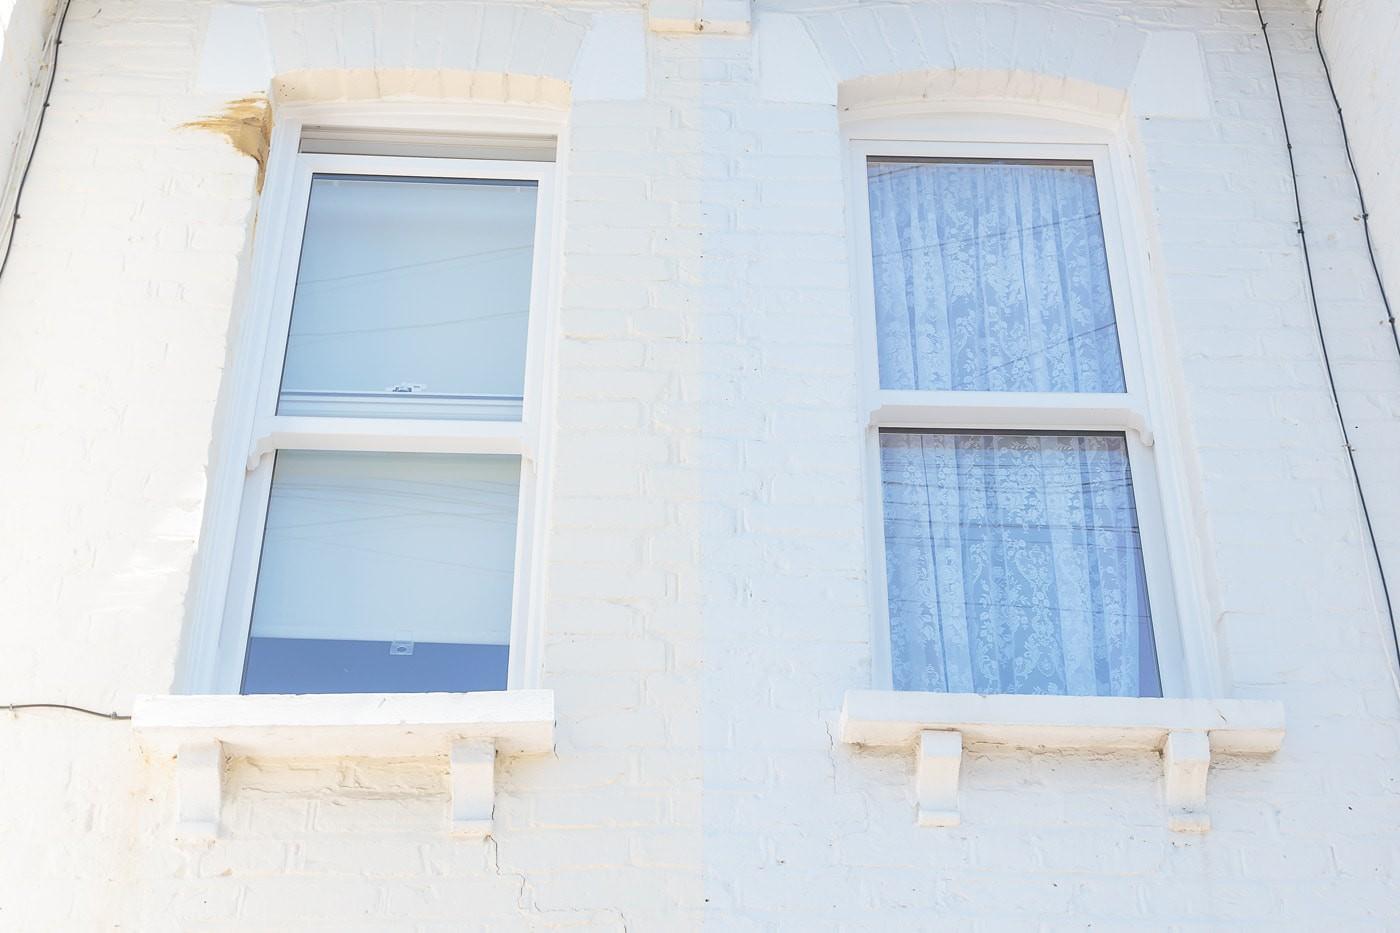 New uPVC windows - complete window replacements in Epsom   Hamiltons